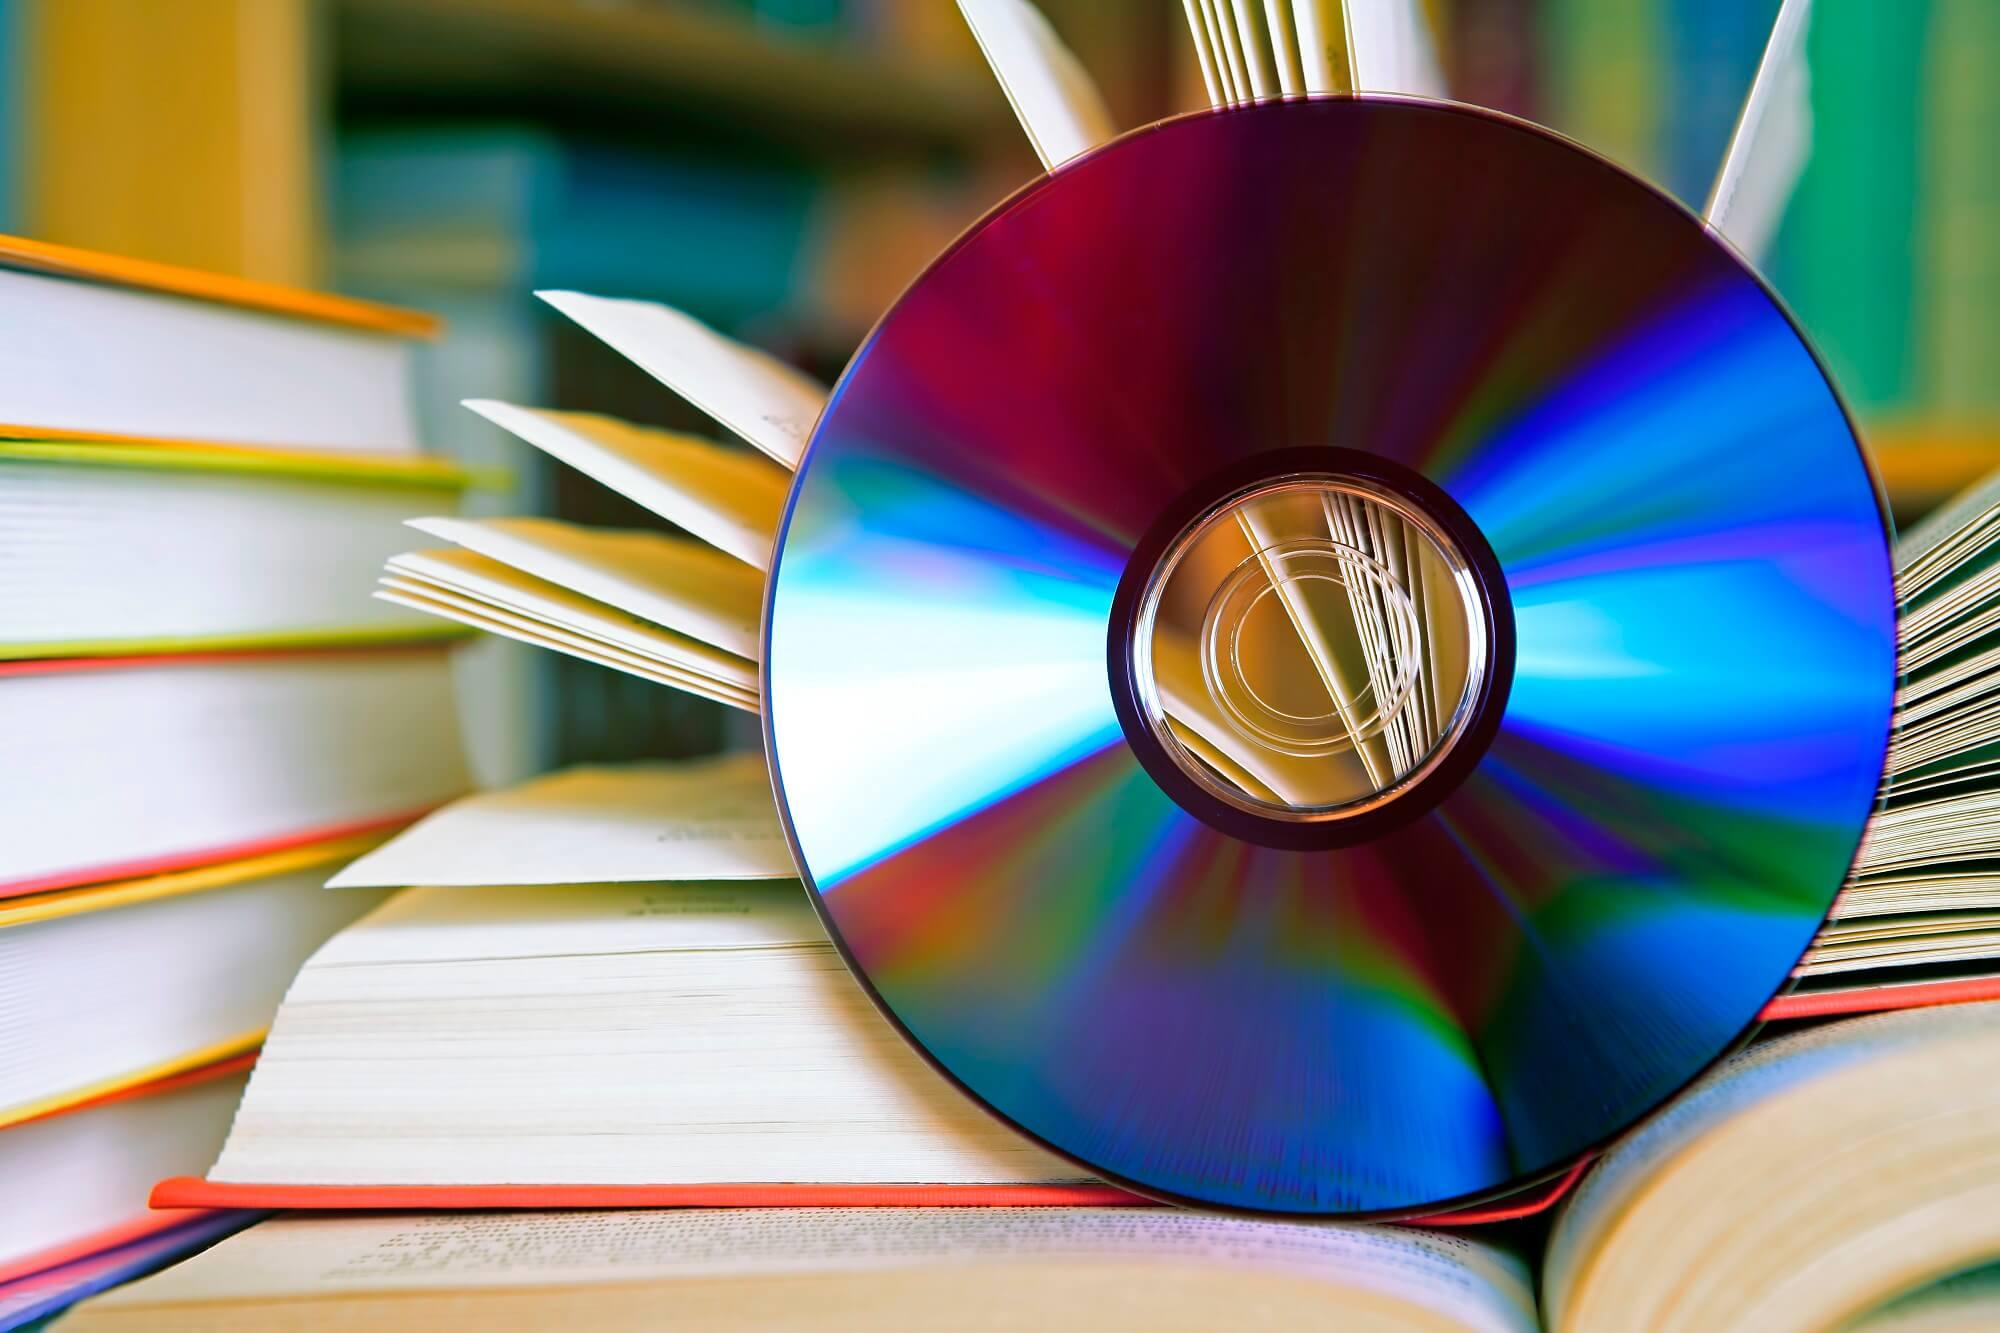 Buecher mit CompactDisk